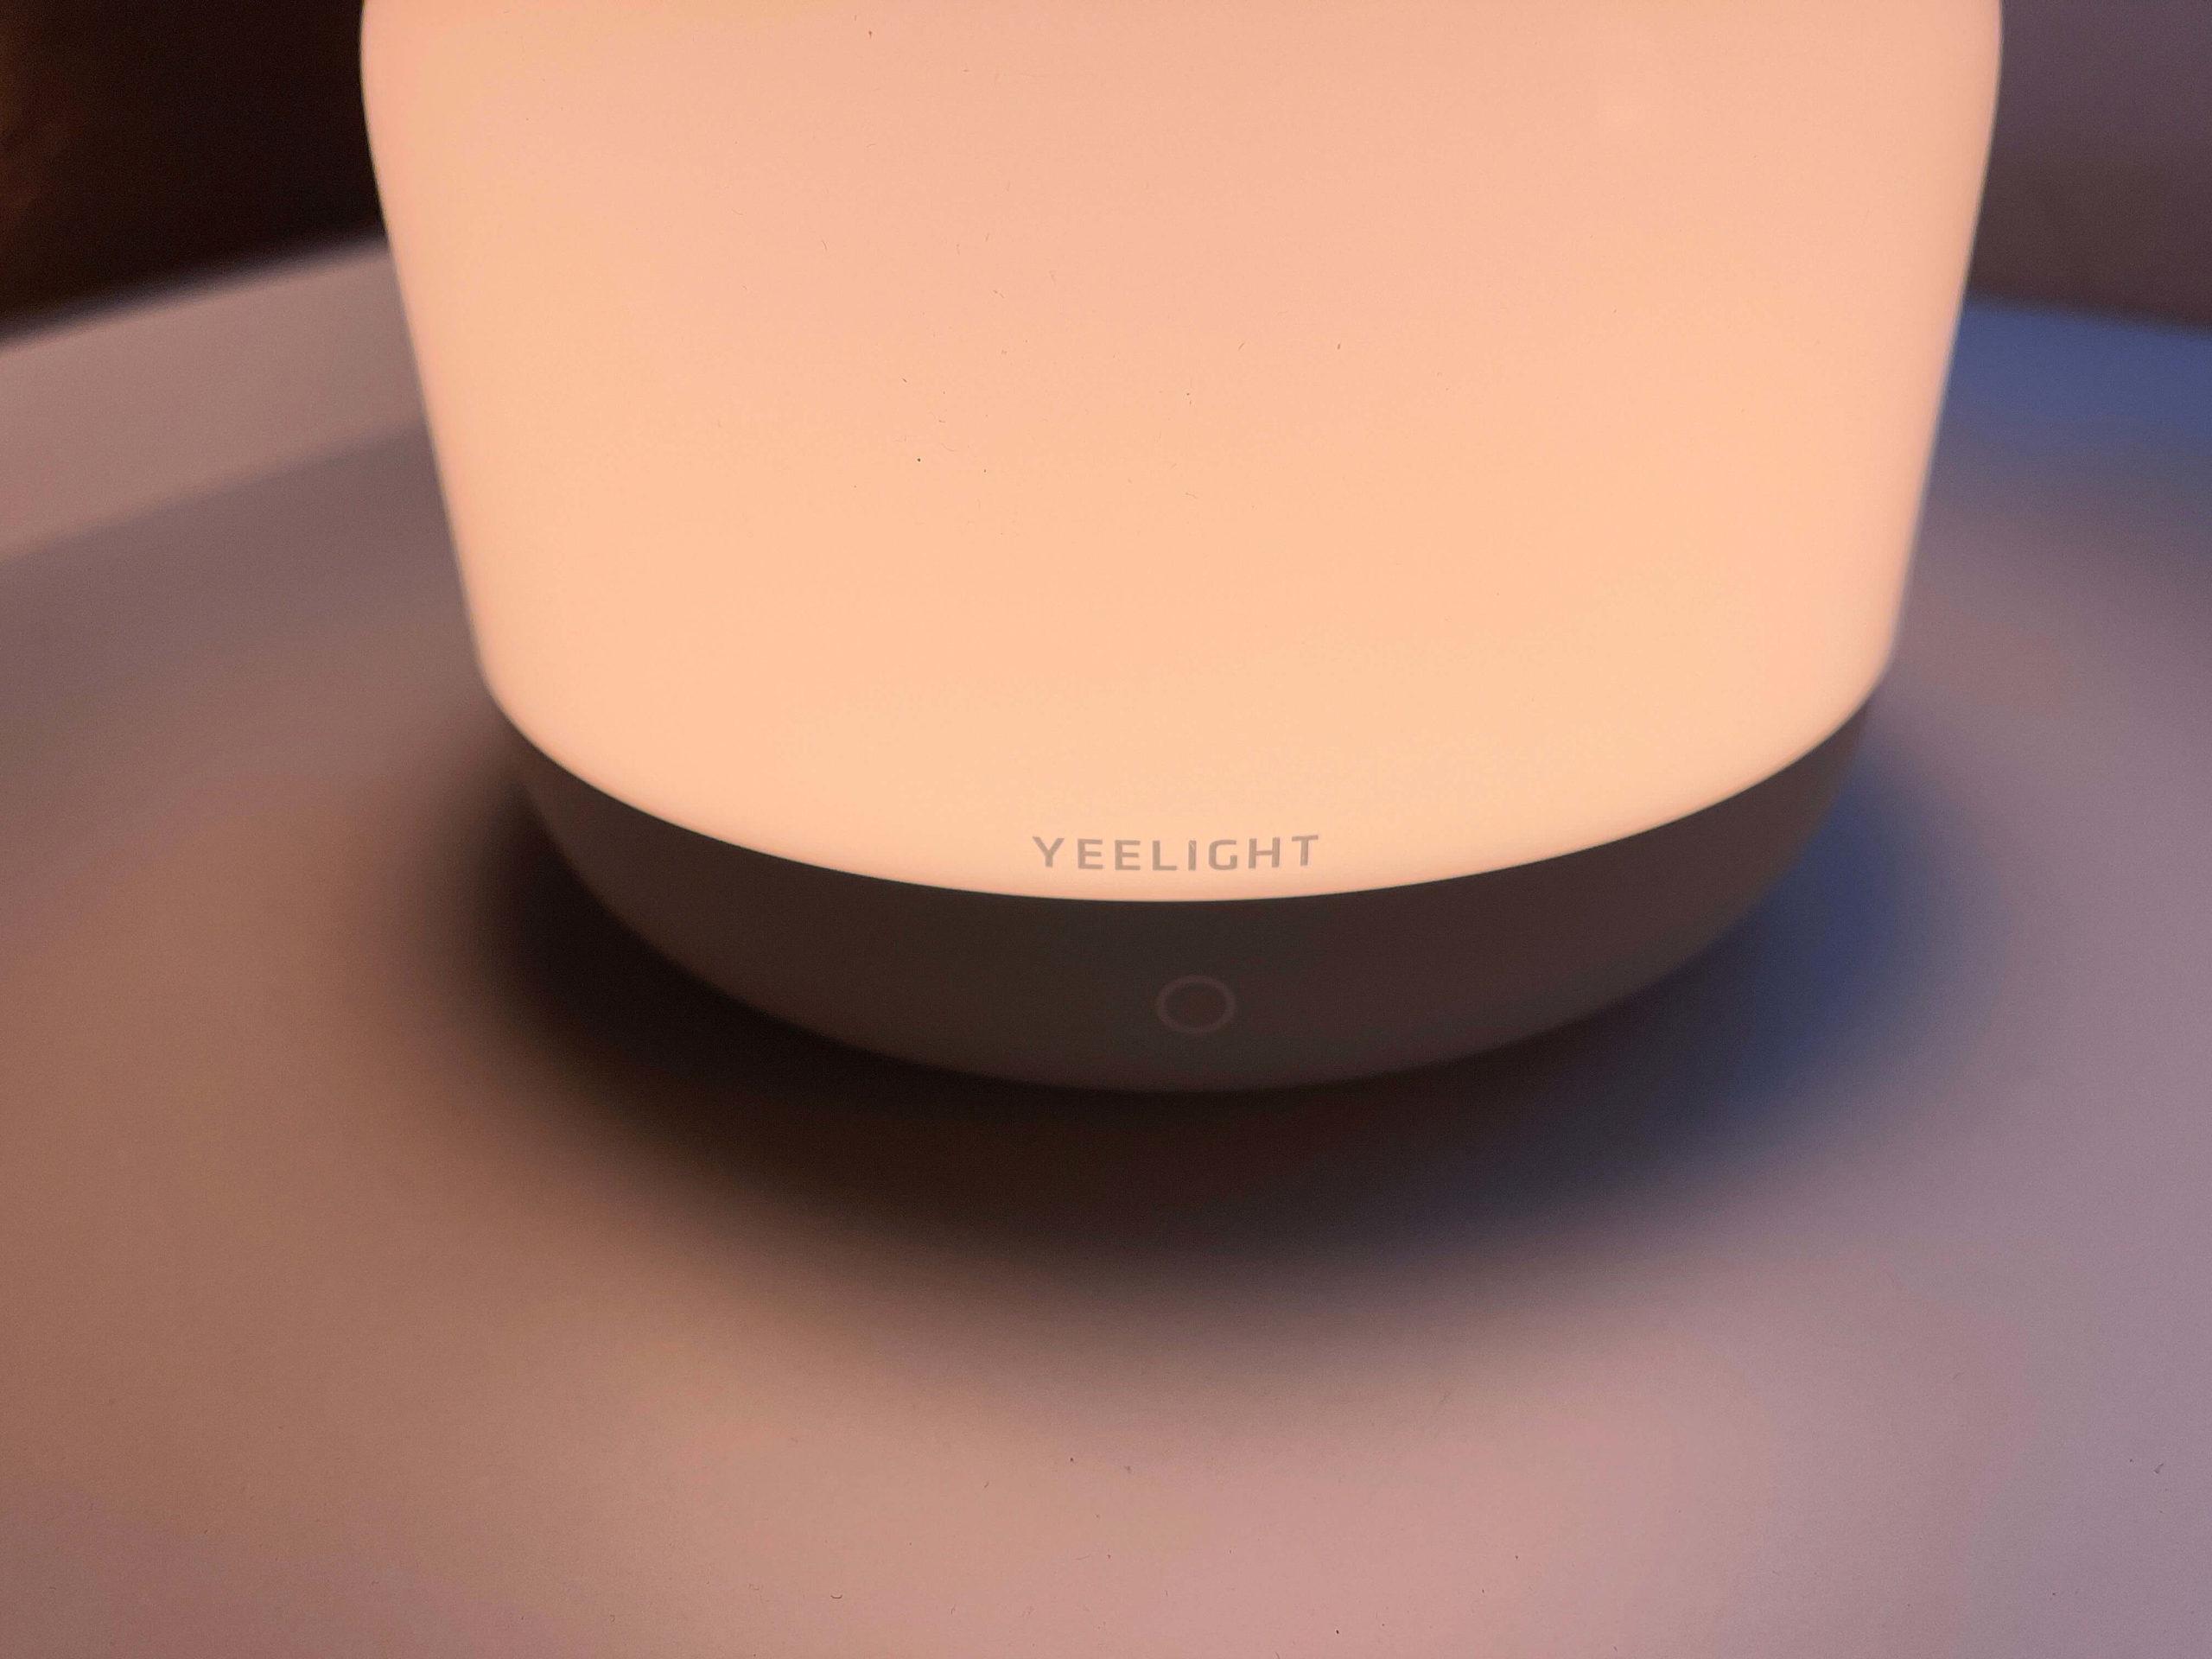 Apple-HomeKit-Nachttischlampe-D2-von-Yeelight2-scaled Nachttischlampe D2 von Yeelight mit Apple HomeKit